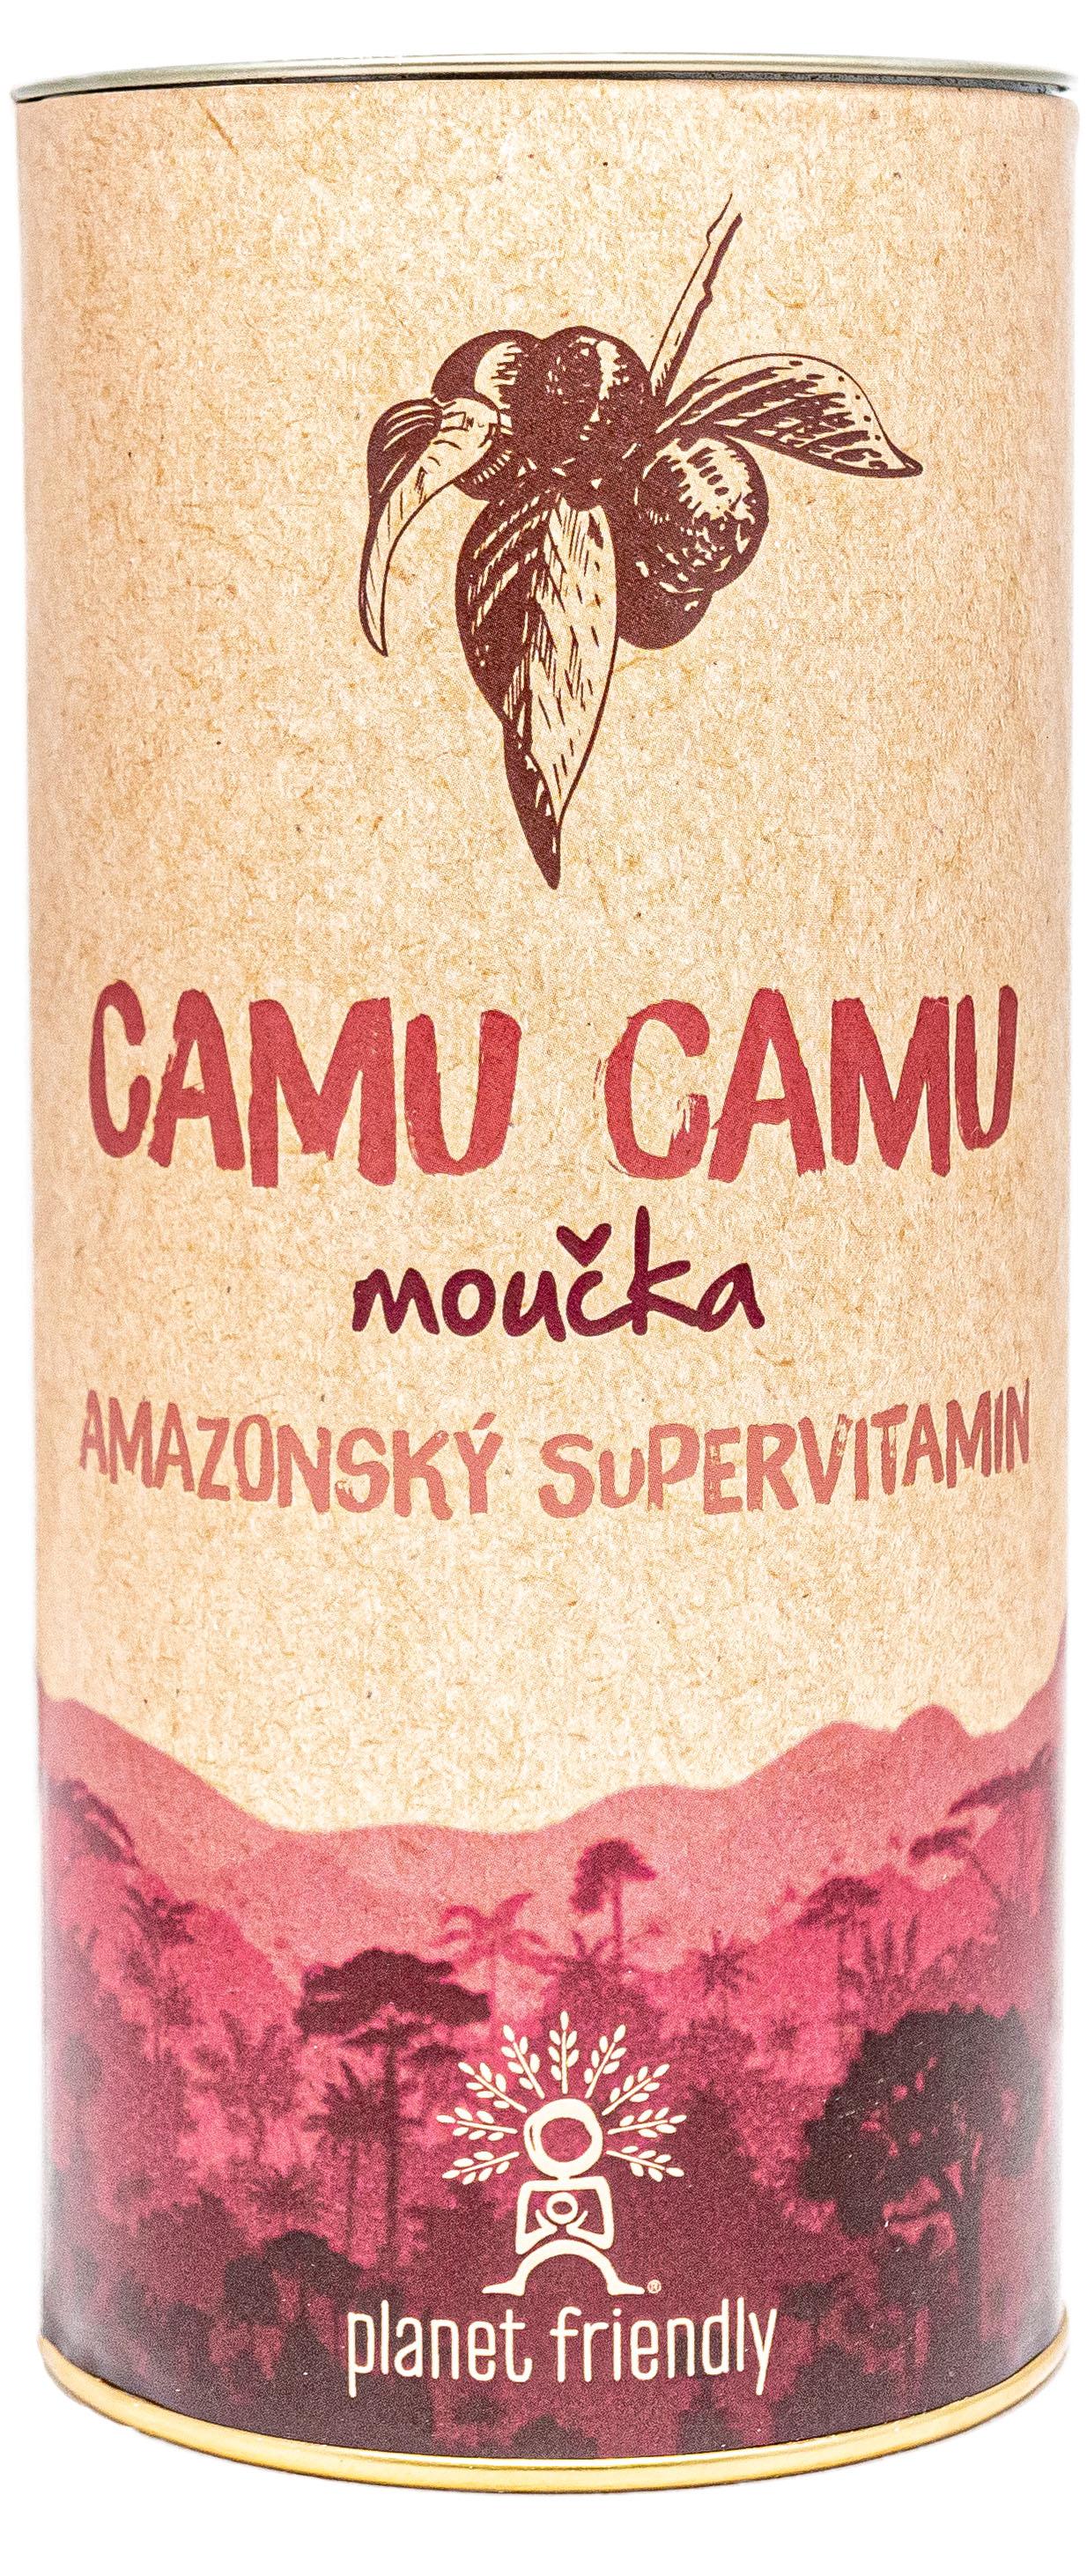 Planet Friendly Camu Camu, 250 g